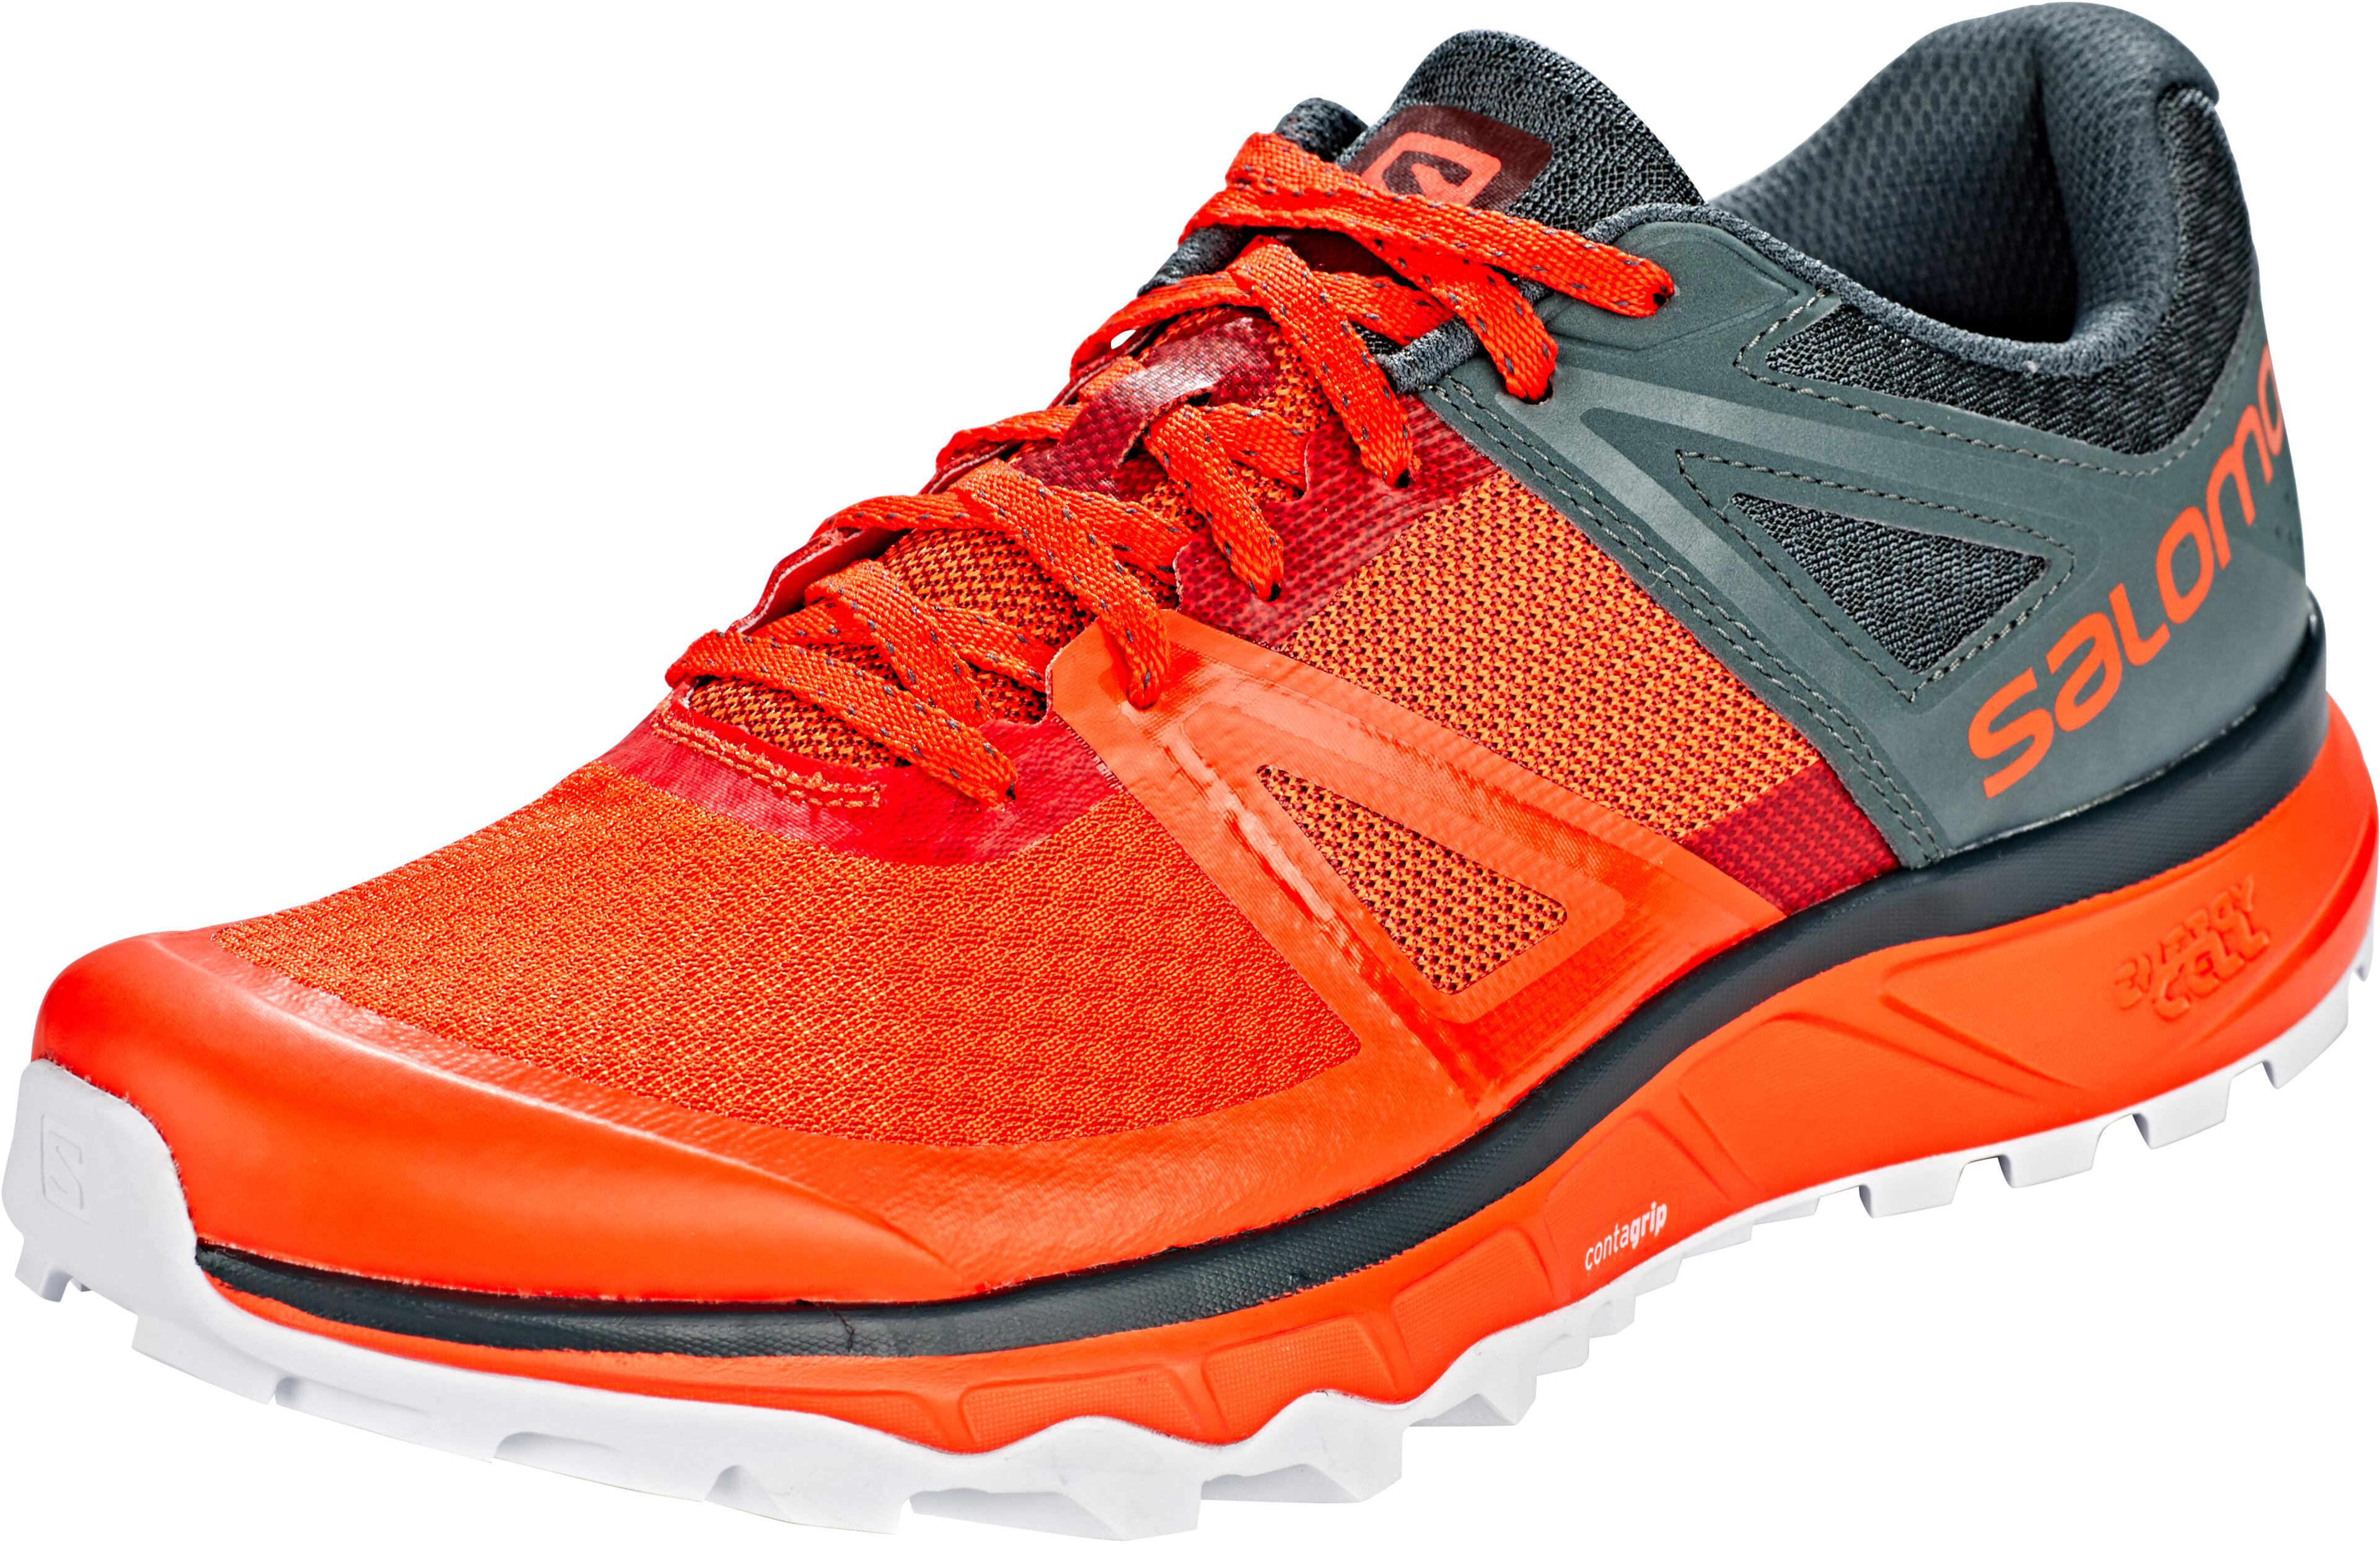 big sale 1dc4d e88fb Salomon Trailster - Chaussures running Homme - gris rouge